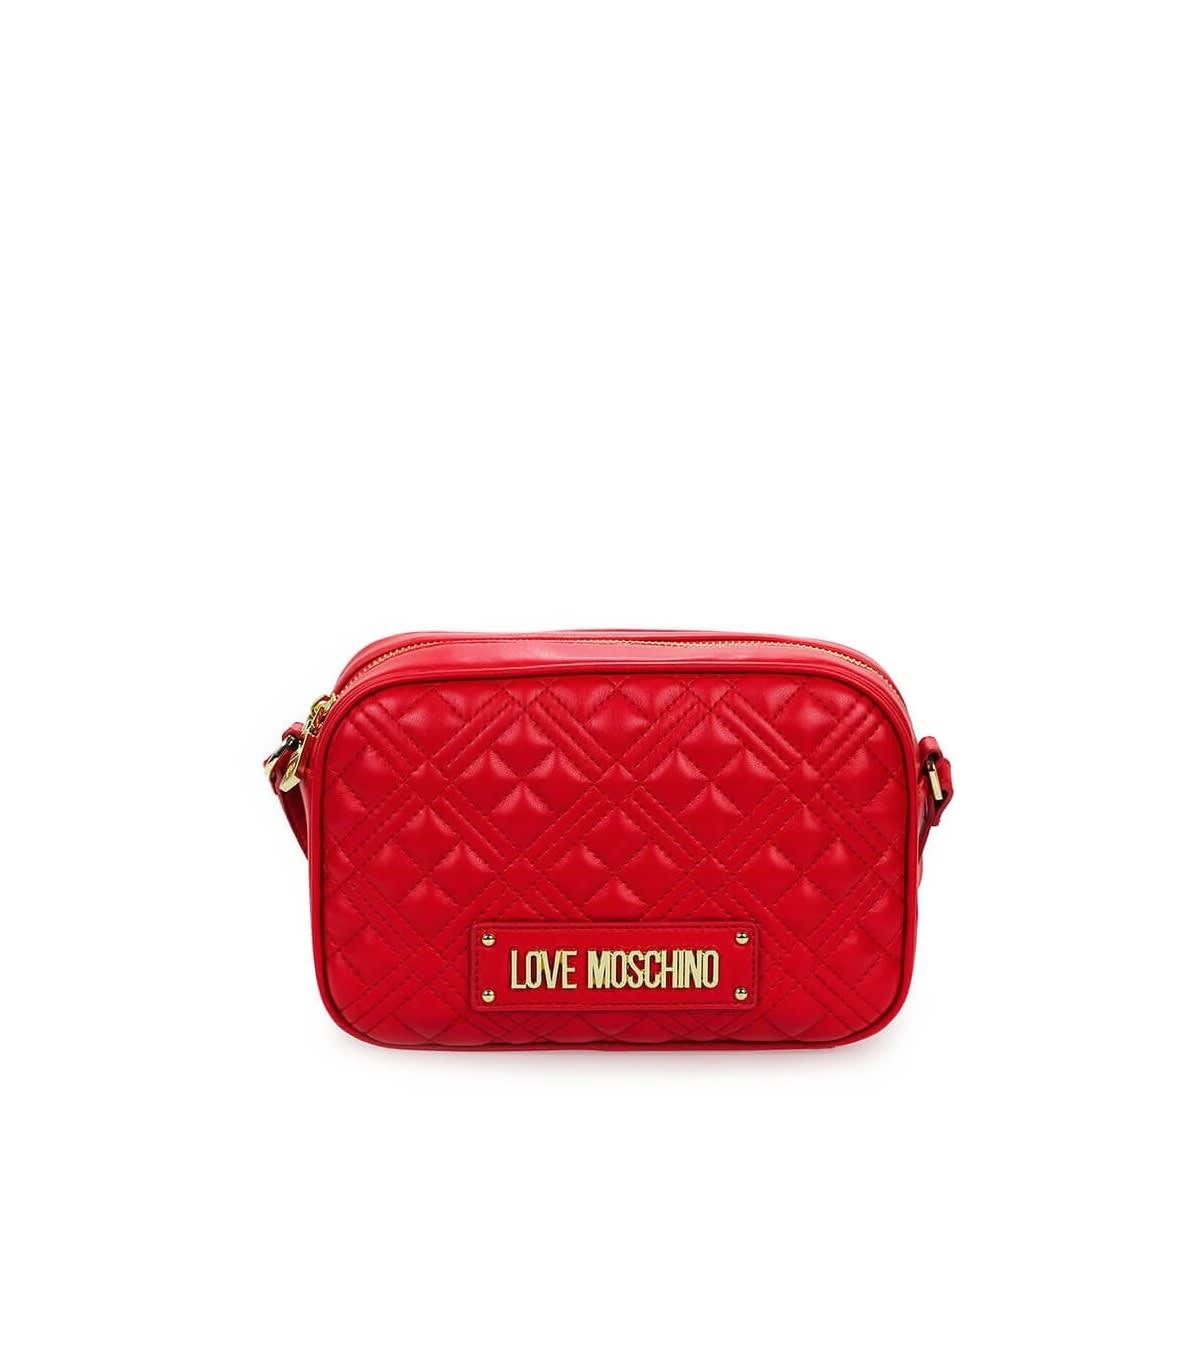 Love Moschino Quilted Red Nappa Medium Crossbody Bag